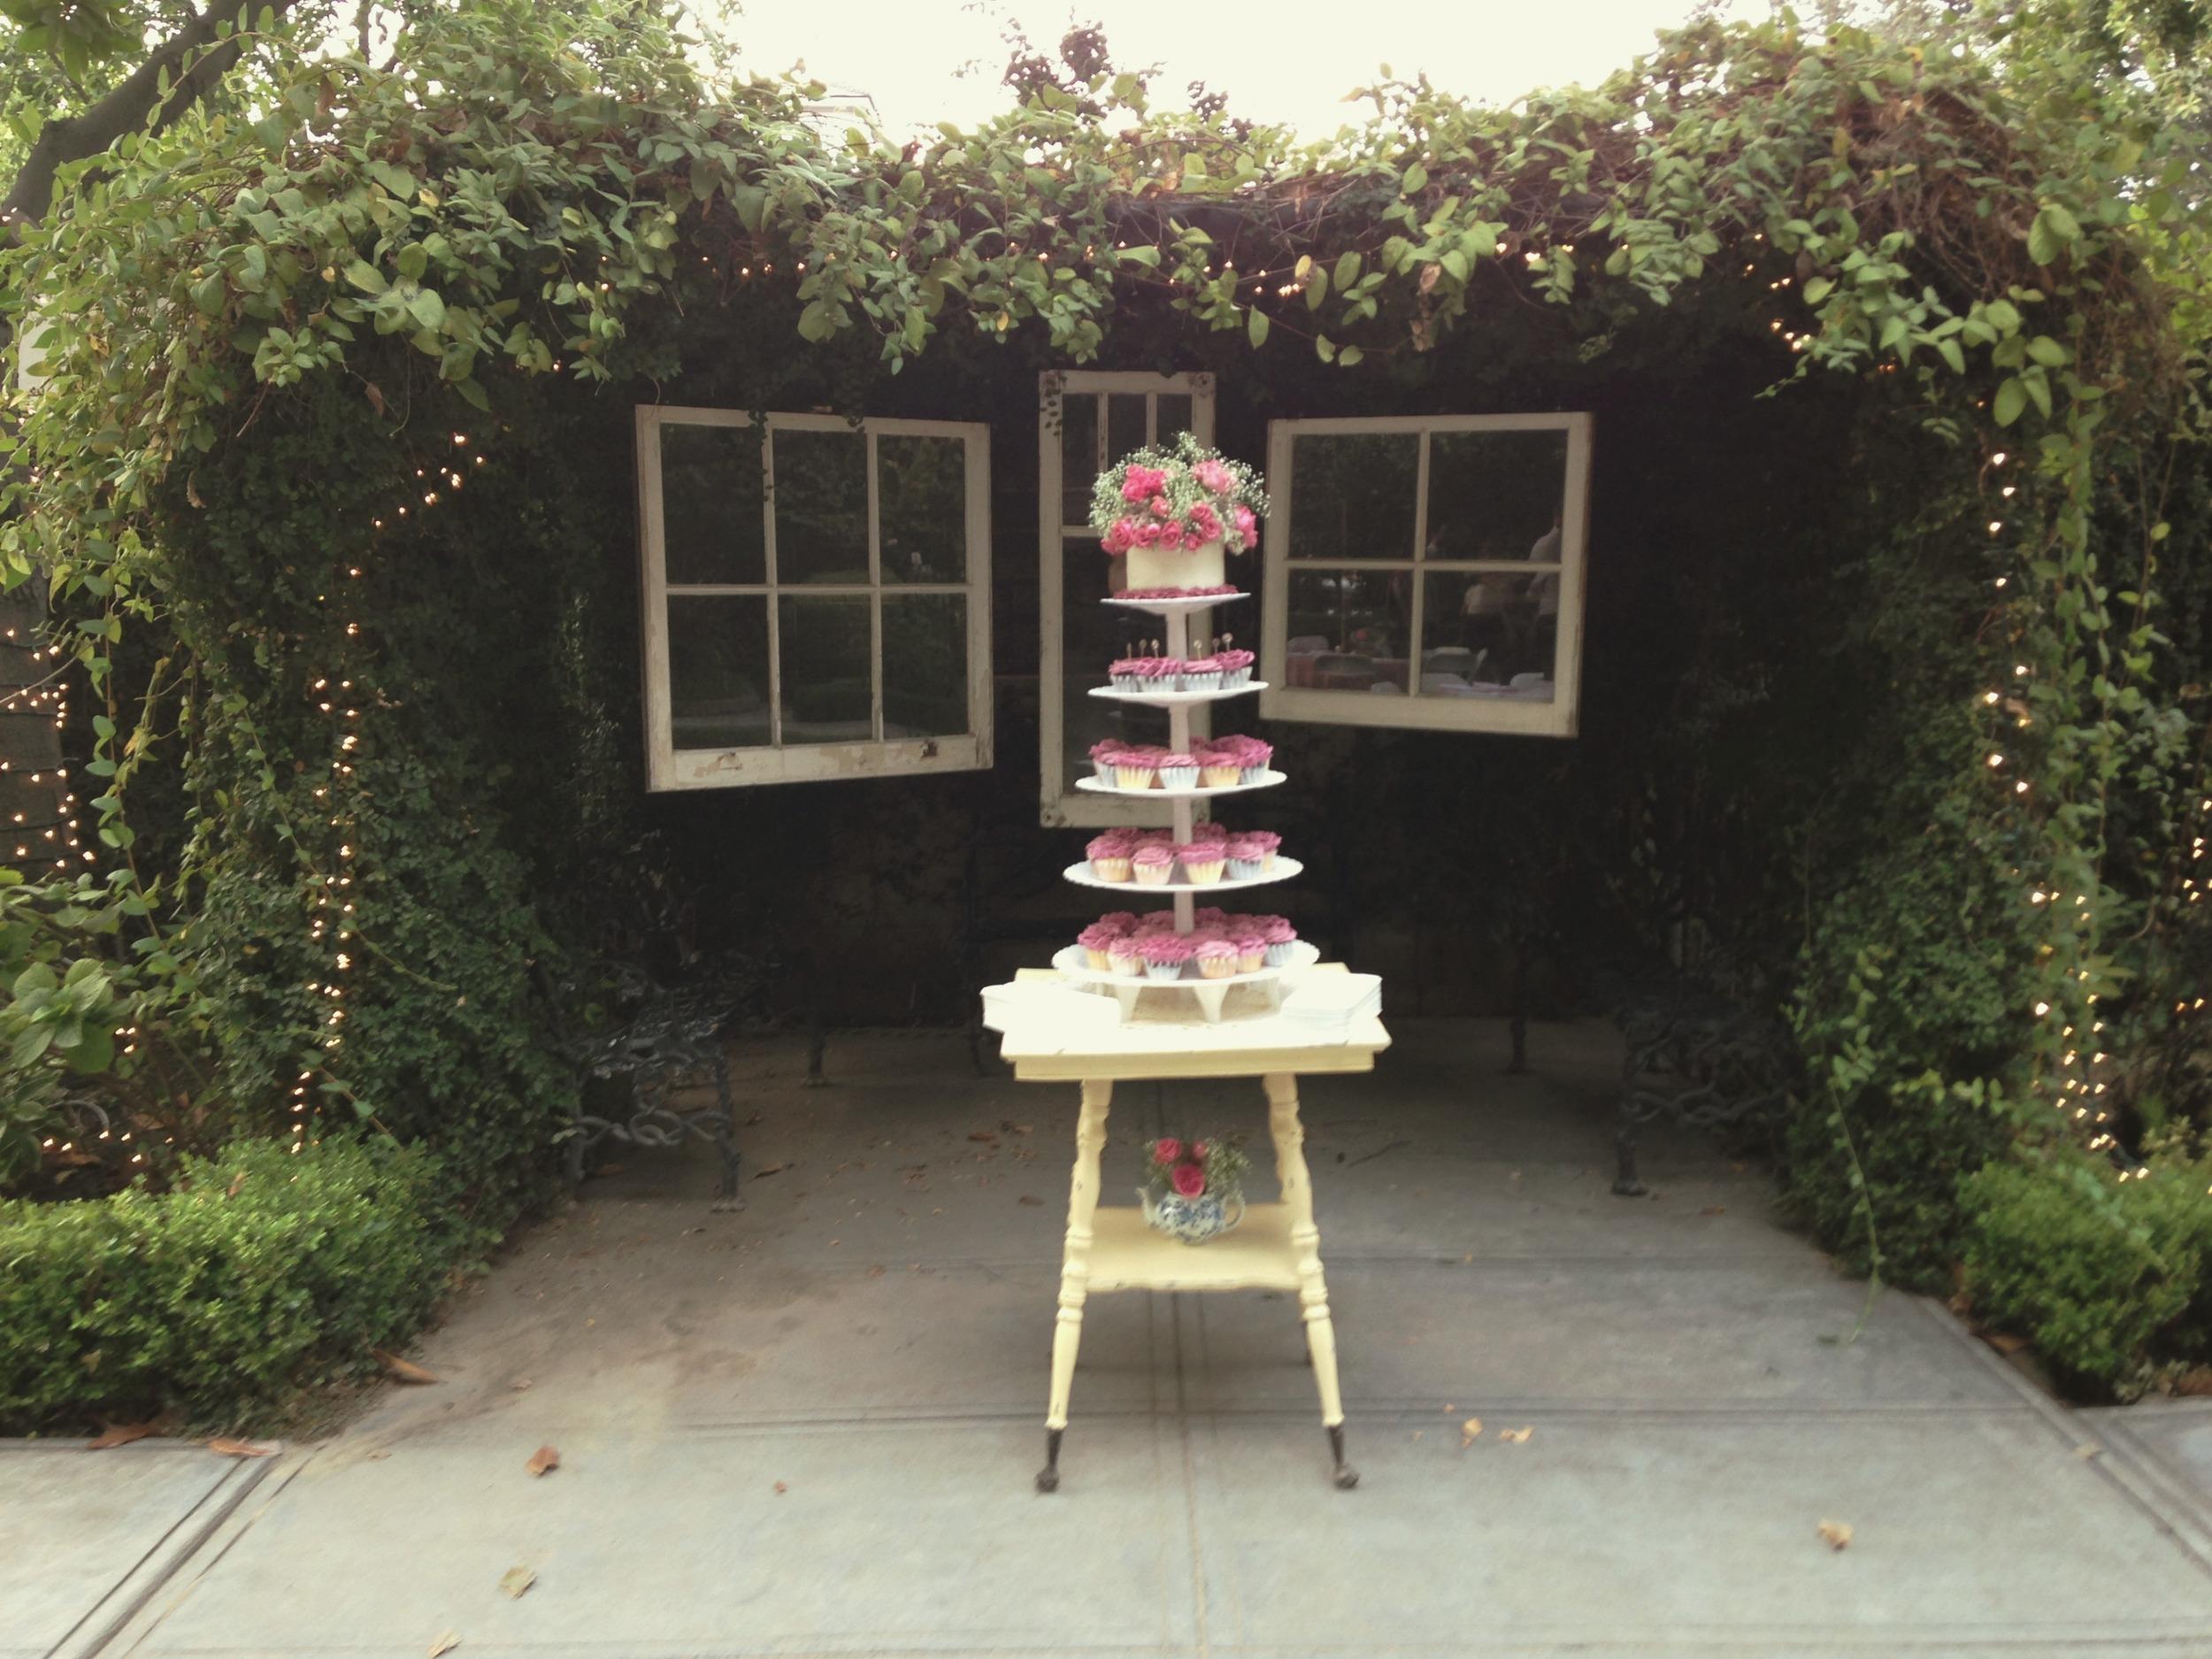 Vintage Wedding Window Backdrop Cake Display